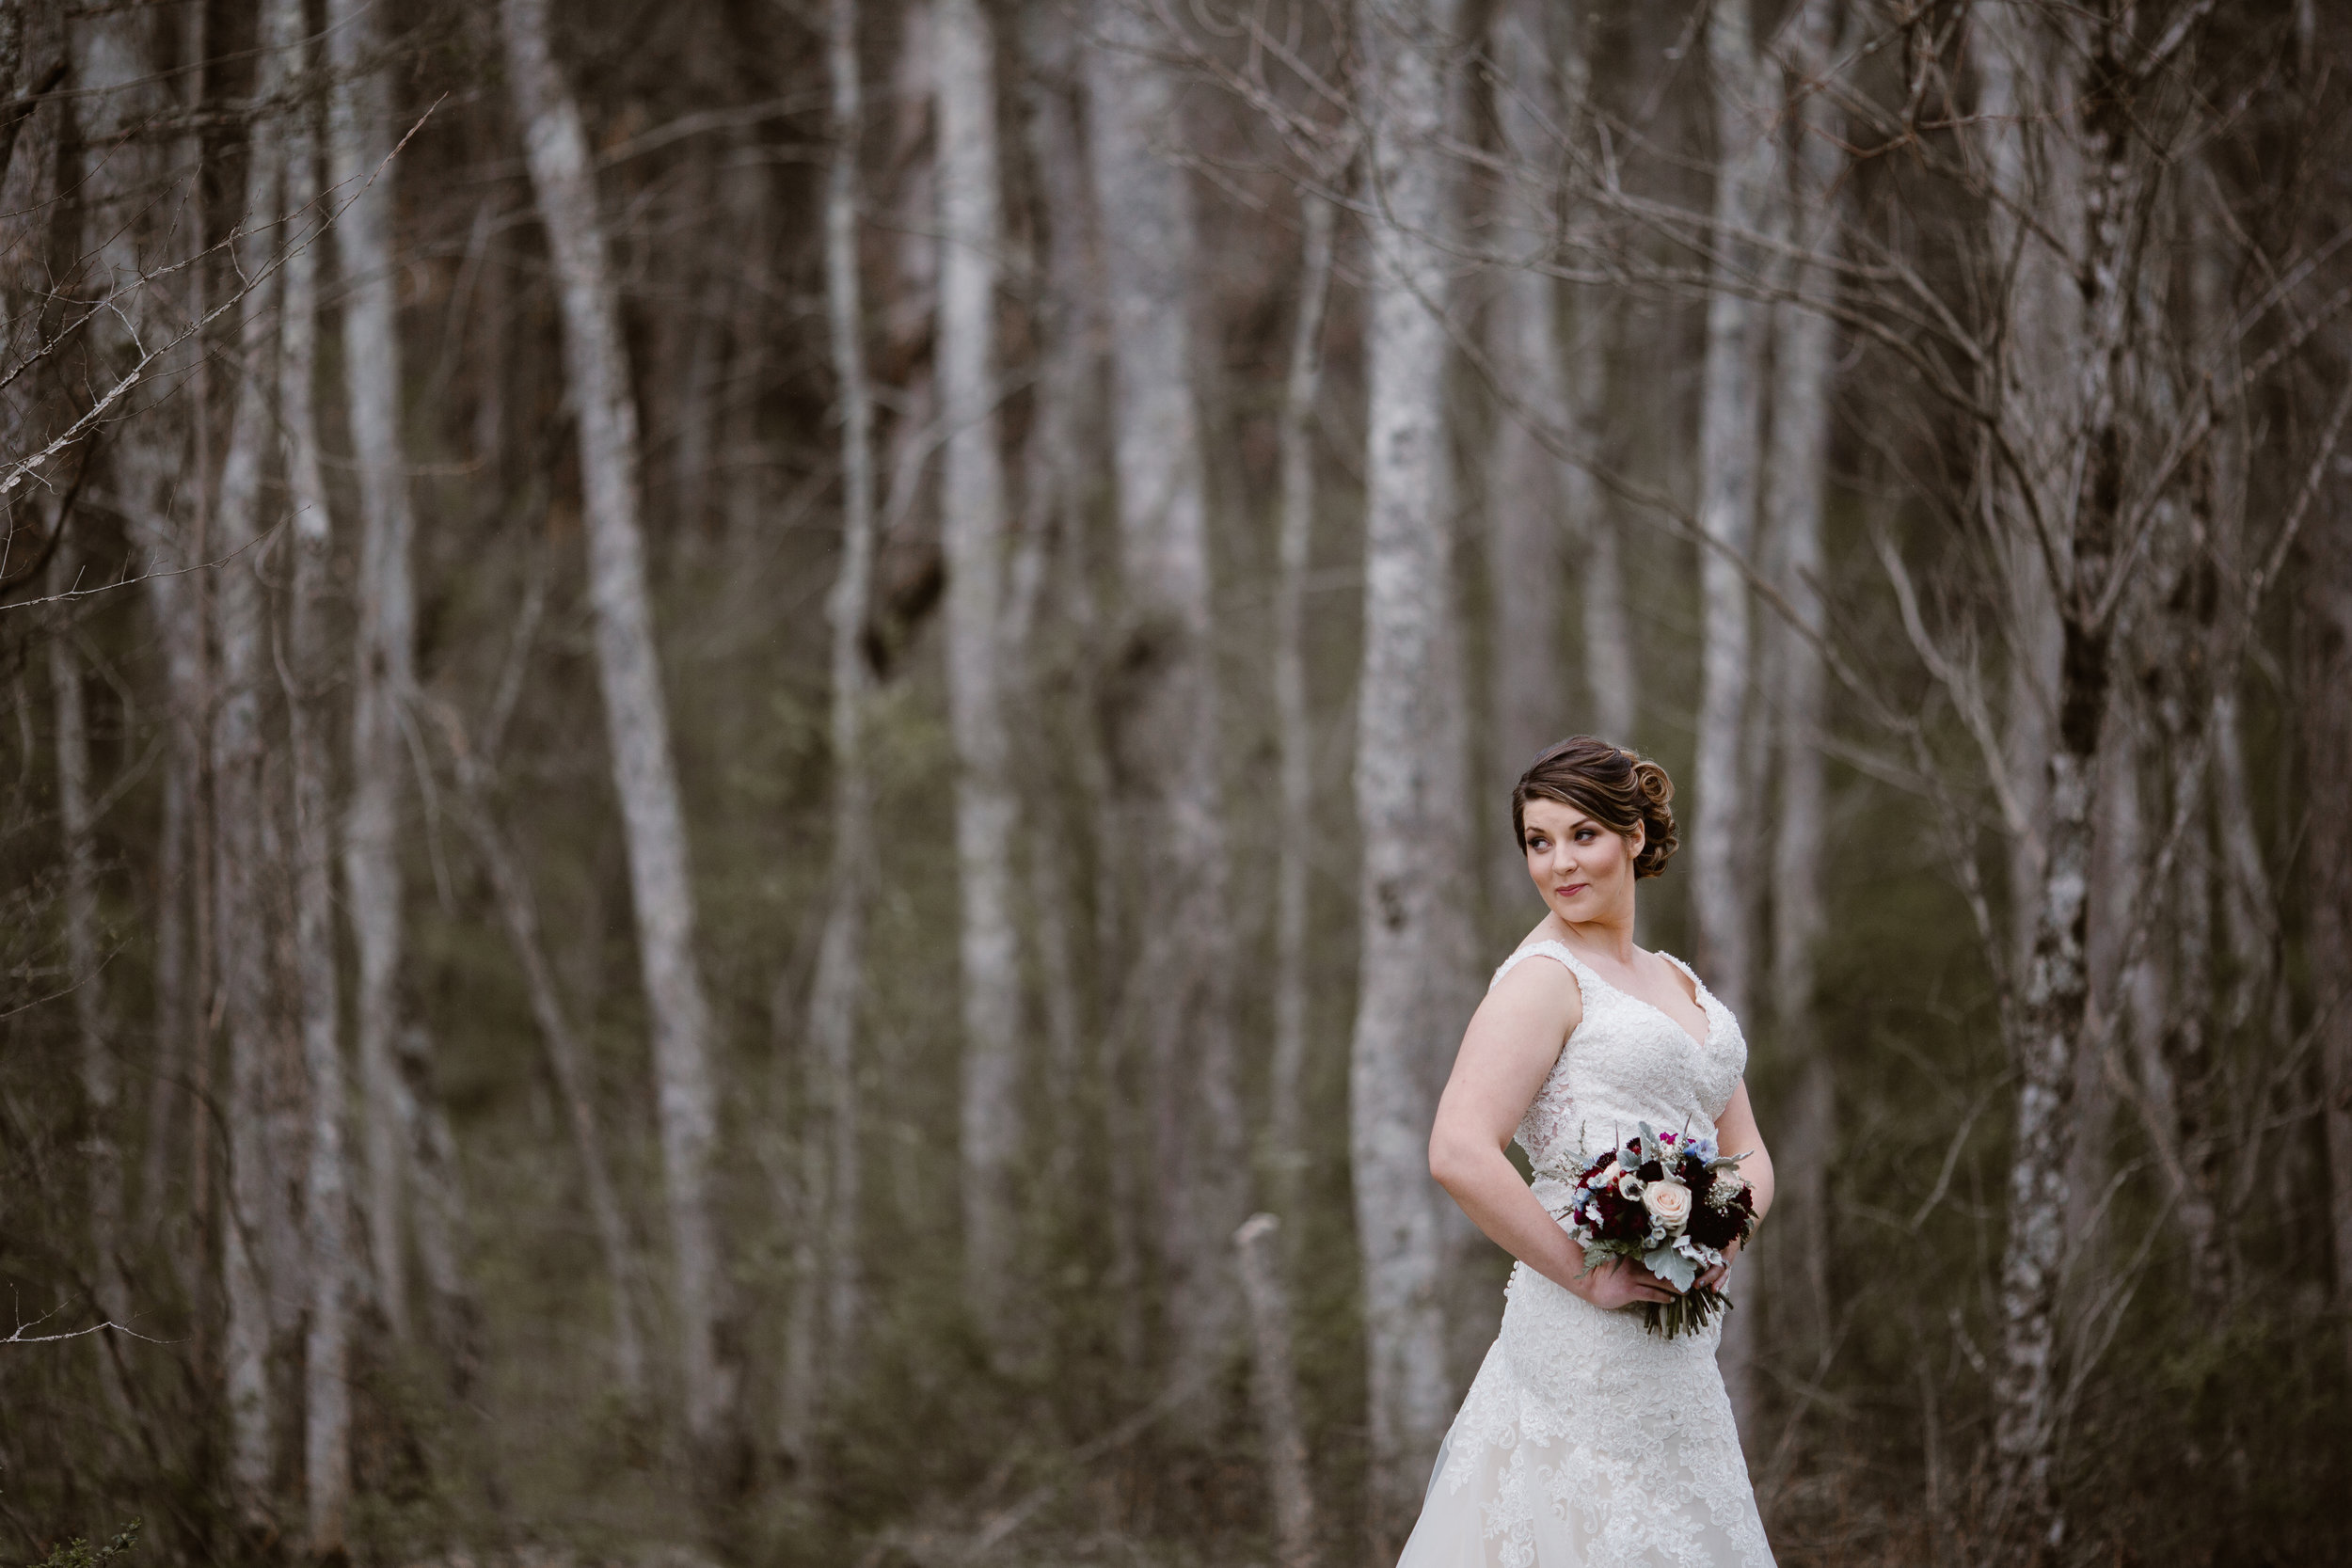 Maroon Fall Wedding Bouquet - A Burgundy + Bronze Ramble Creek Fall Wedding - Erin Morrison Photography